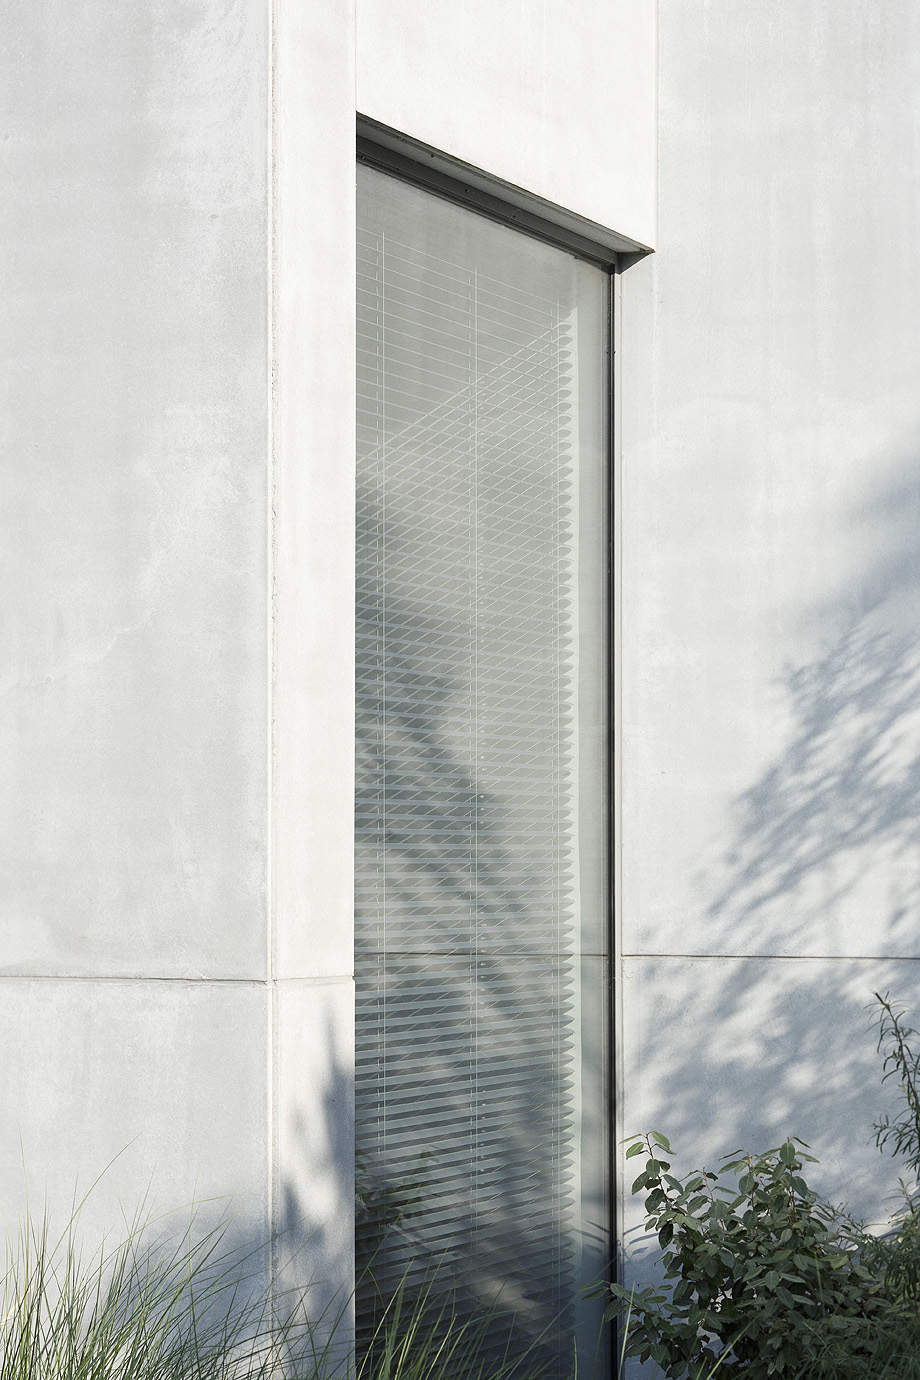 casa vle de ism architecten y paul ibens (24)